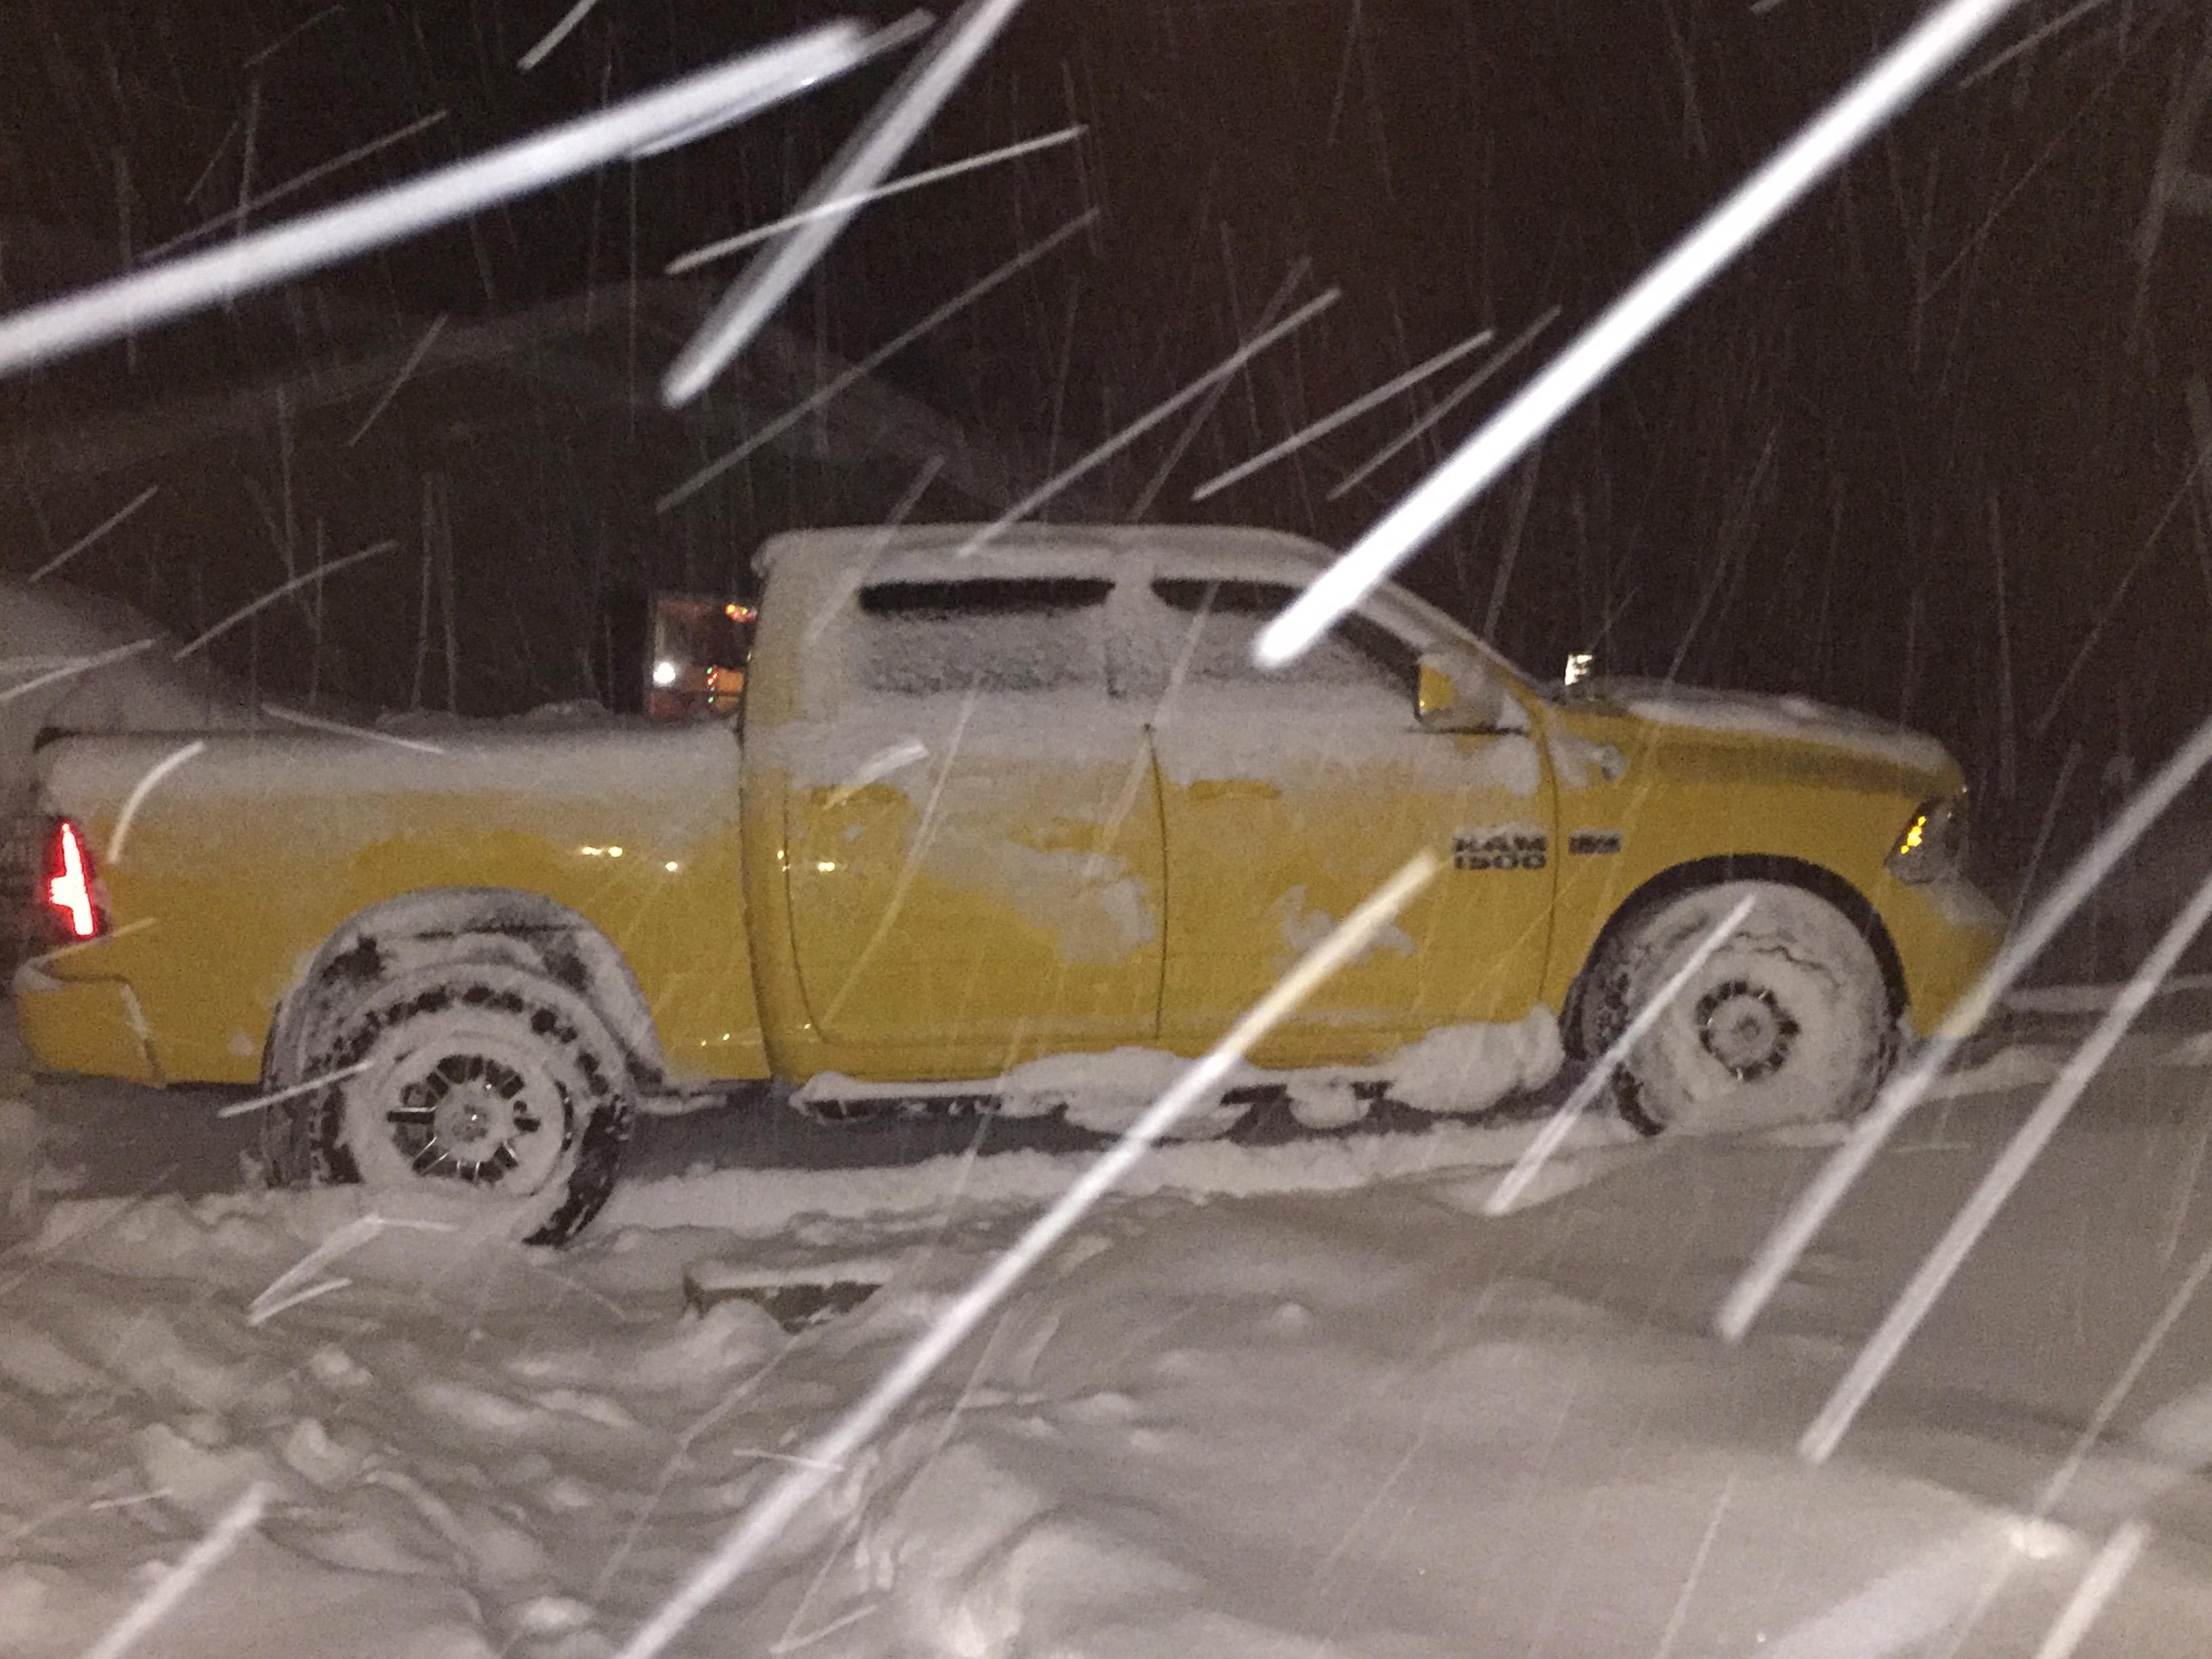 010717-cc-dashing-through-the-snow-2